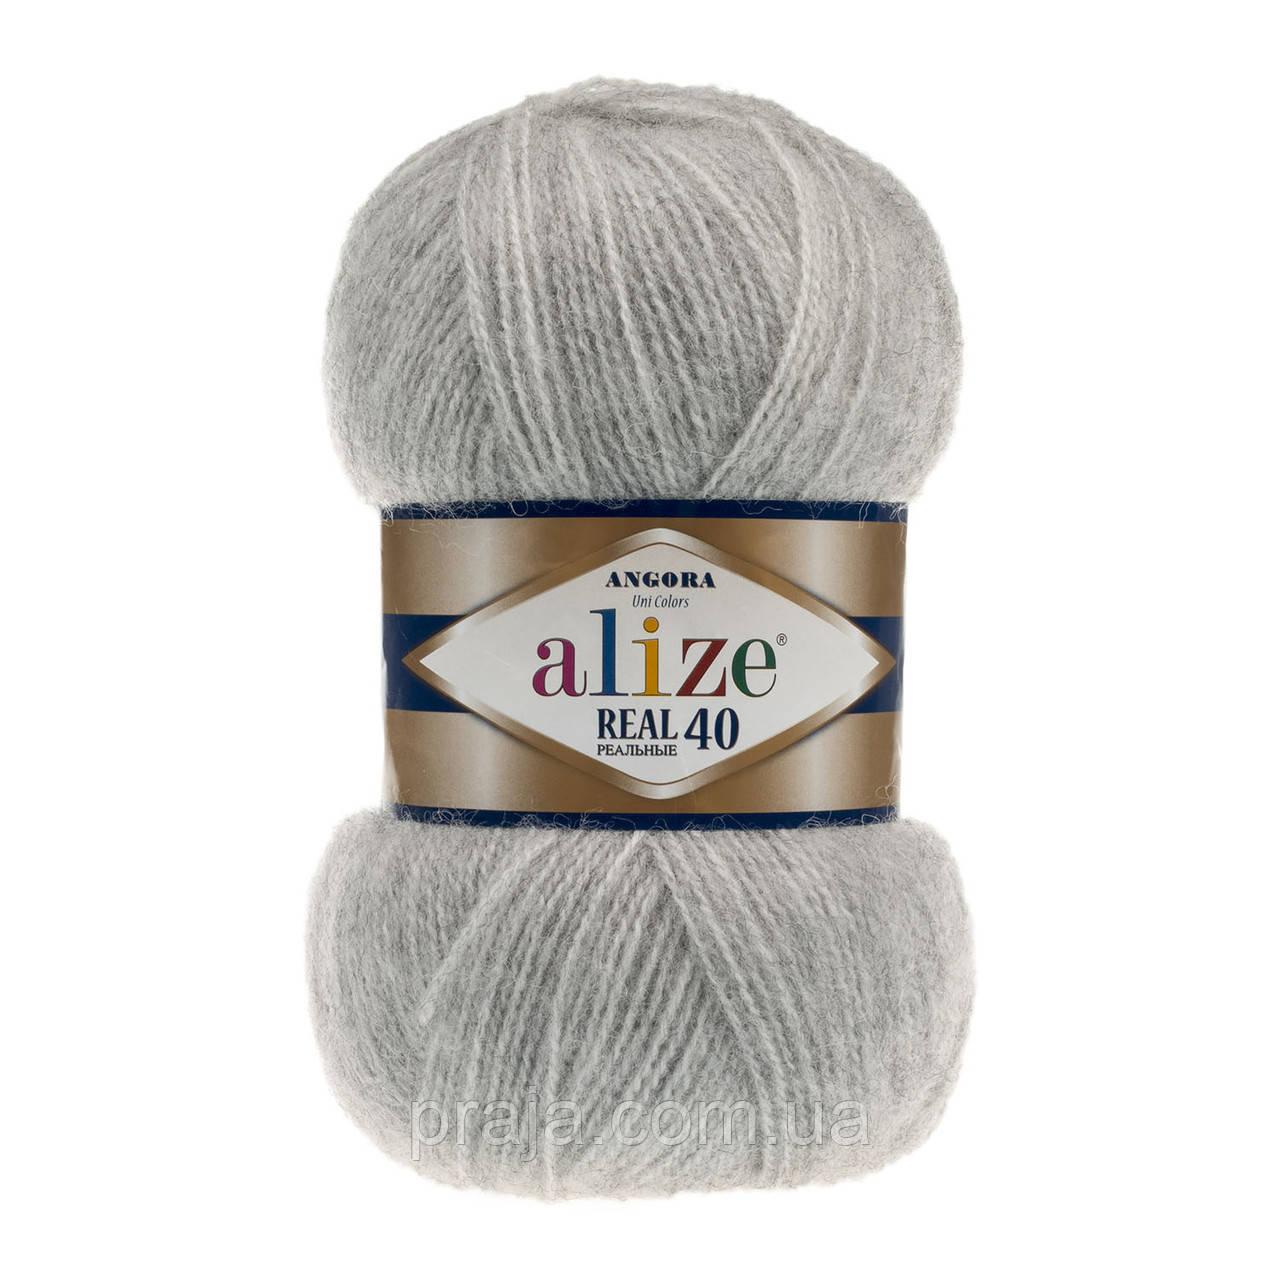 Alize Angora Real 40 614 серый меланж продажа цена в хмельницком